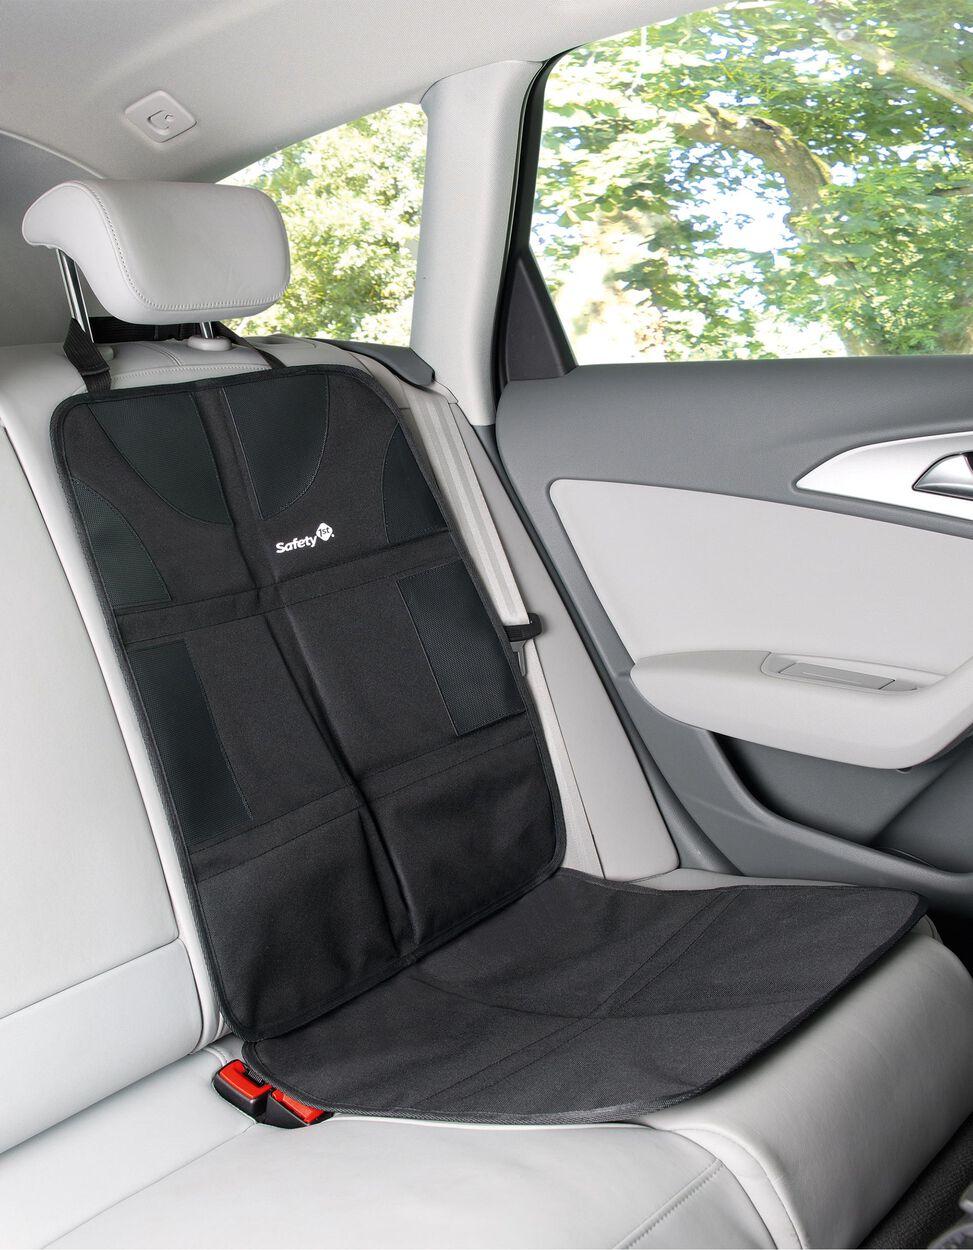 Protetor para assento Auto Safety 1St